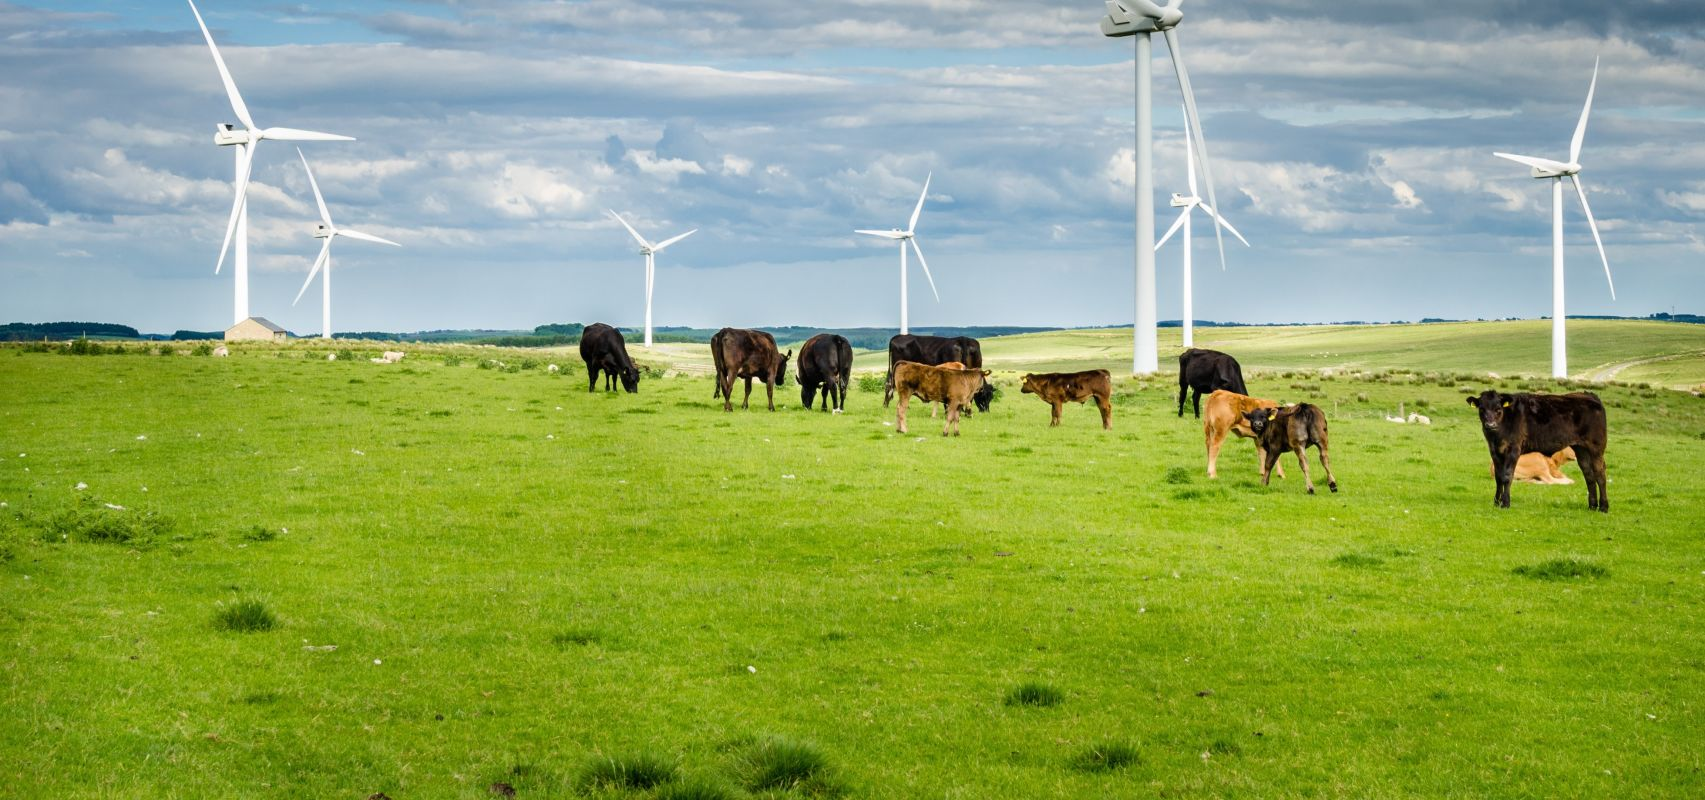 Wind Turbines - UK CSR HR (iStock-585518028) - cropped